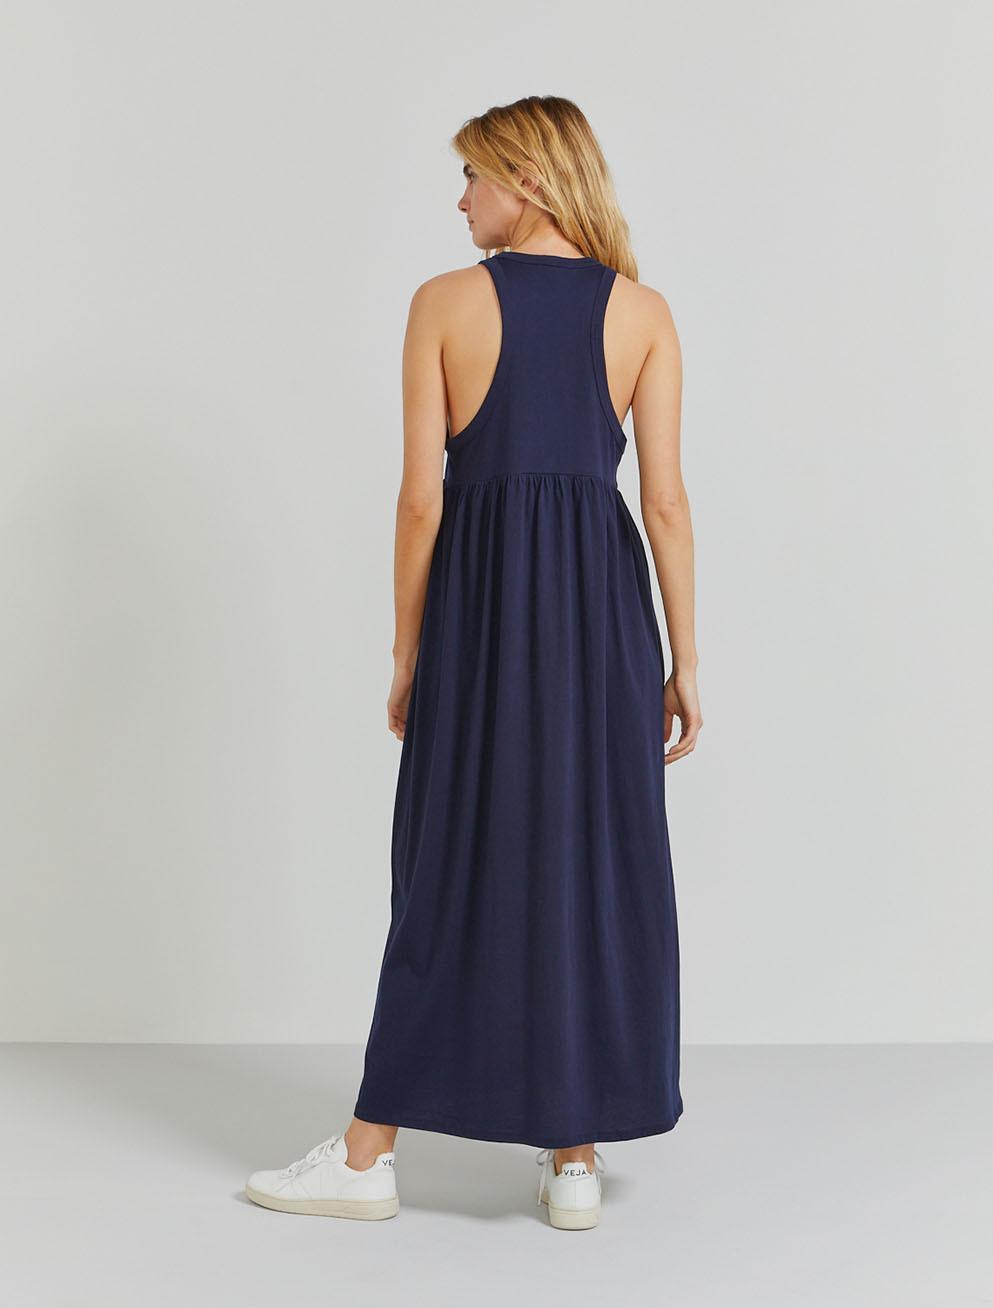 Organic cotton sleeveless maxi dress